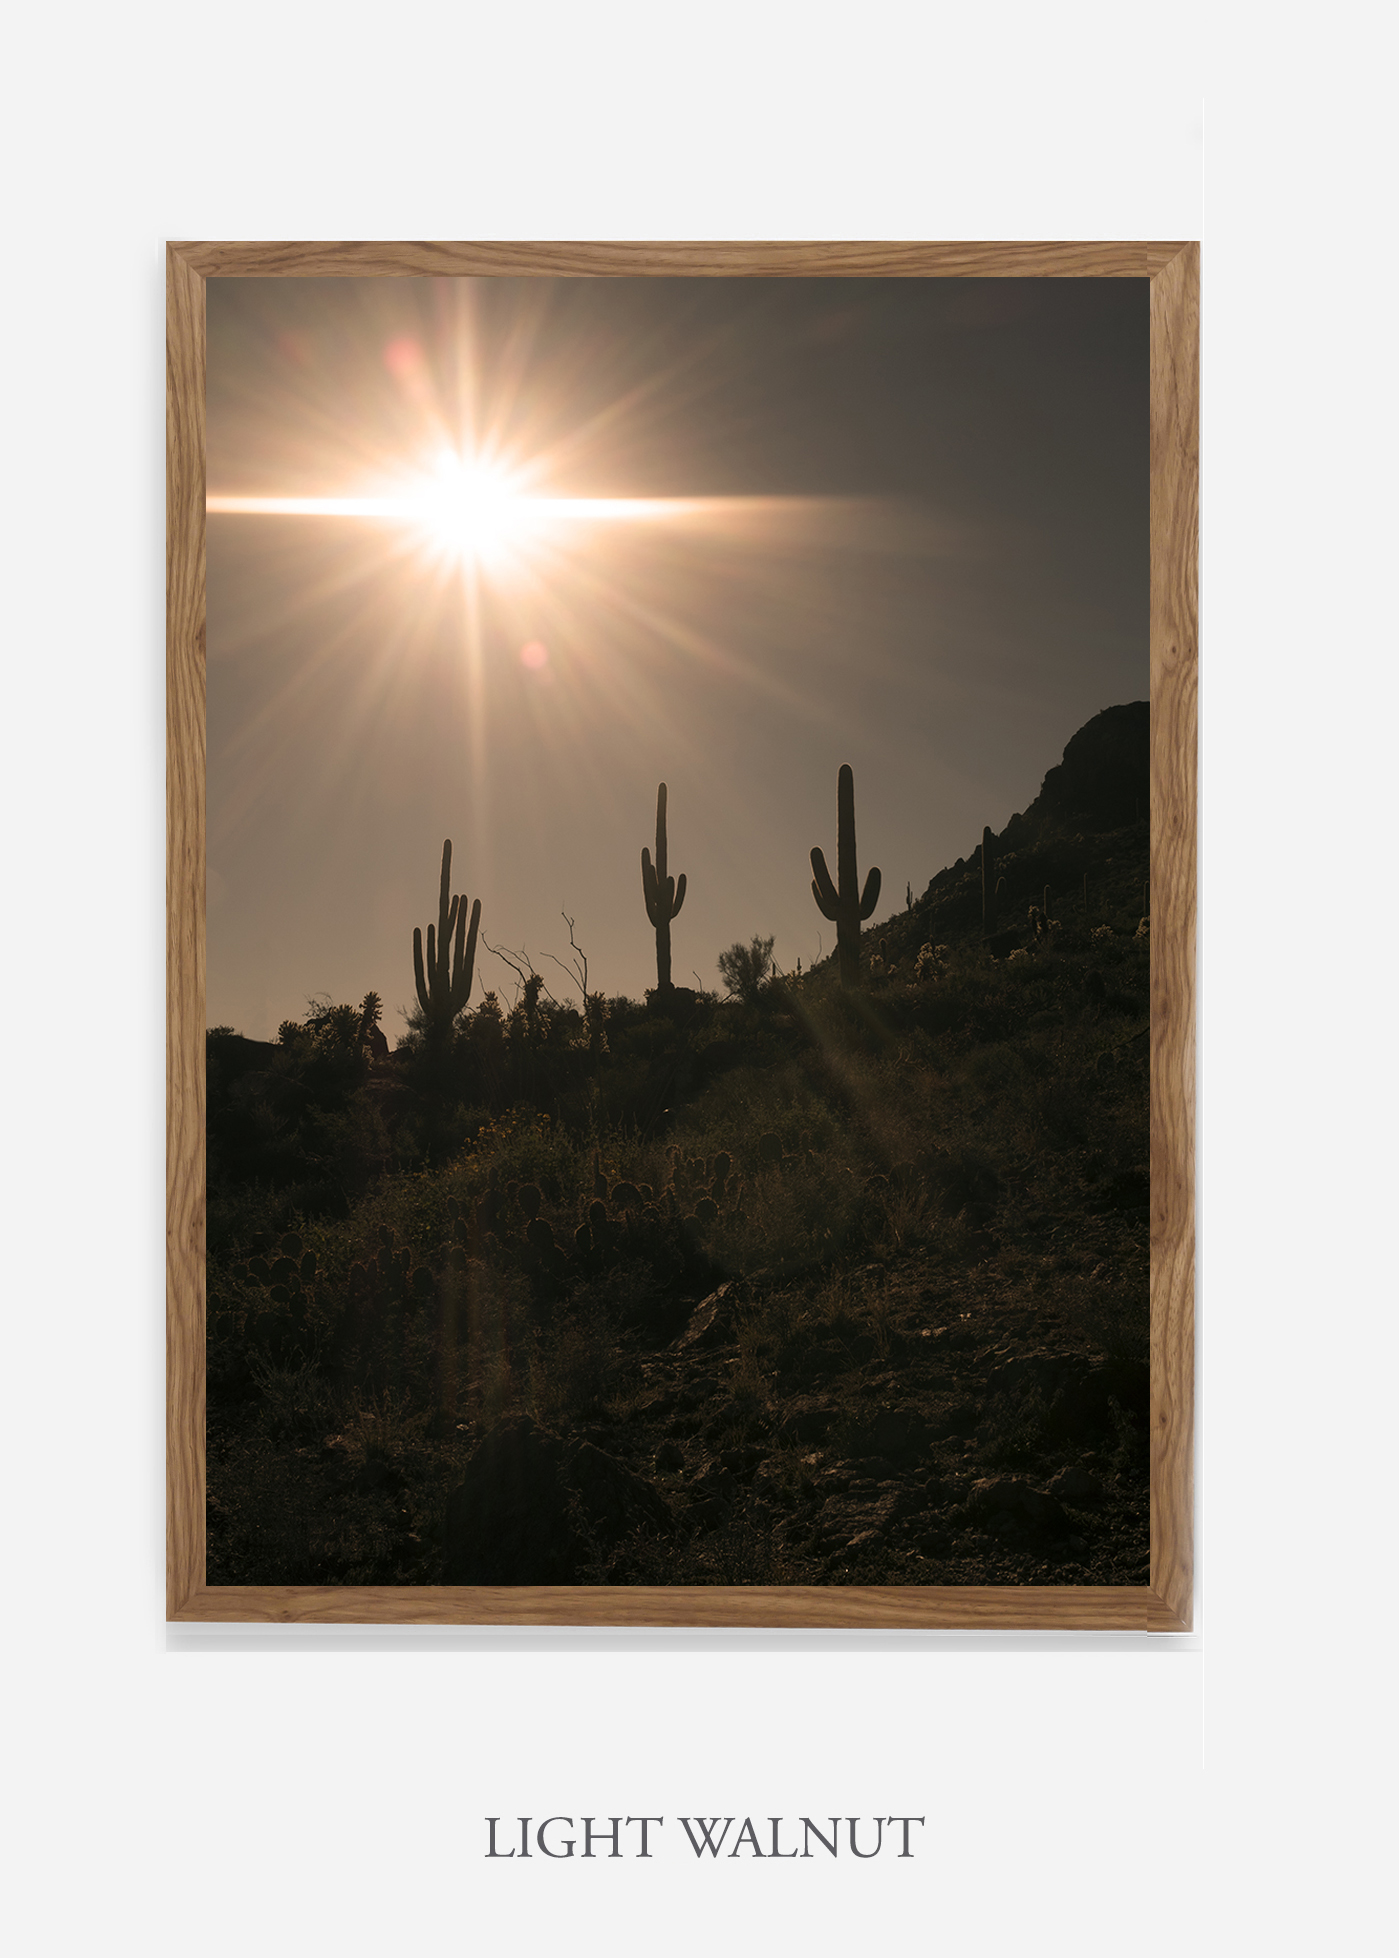 nomat-lightwalnutframe-saguaroNo.16-wildercalifornia-art-wallart-cactusprint-homedecor-prints-arizona-botanical-artwork-interiordesign.jpg